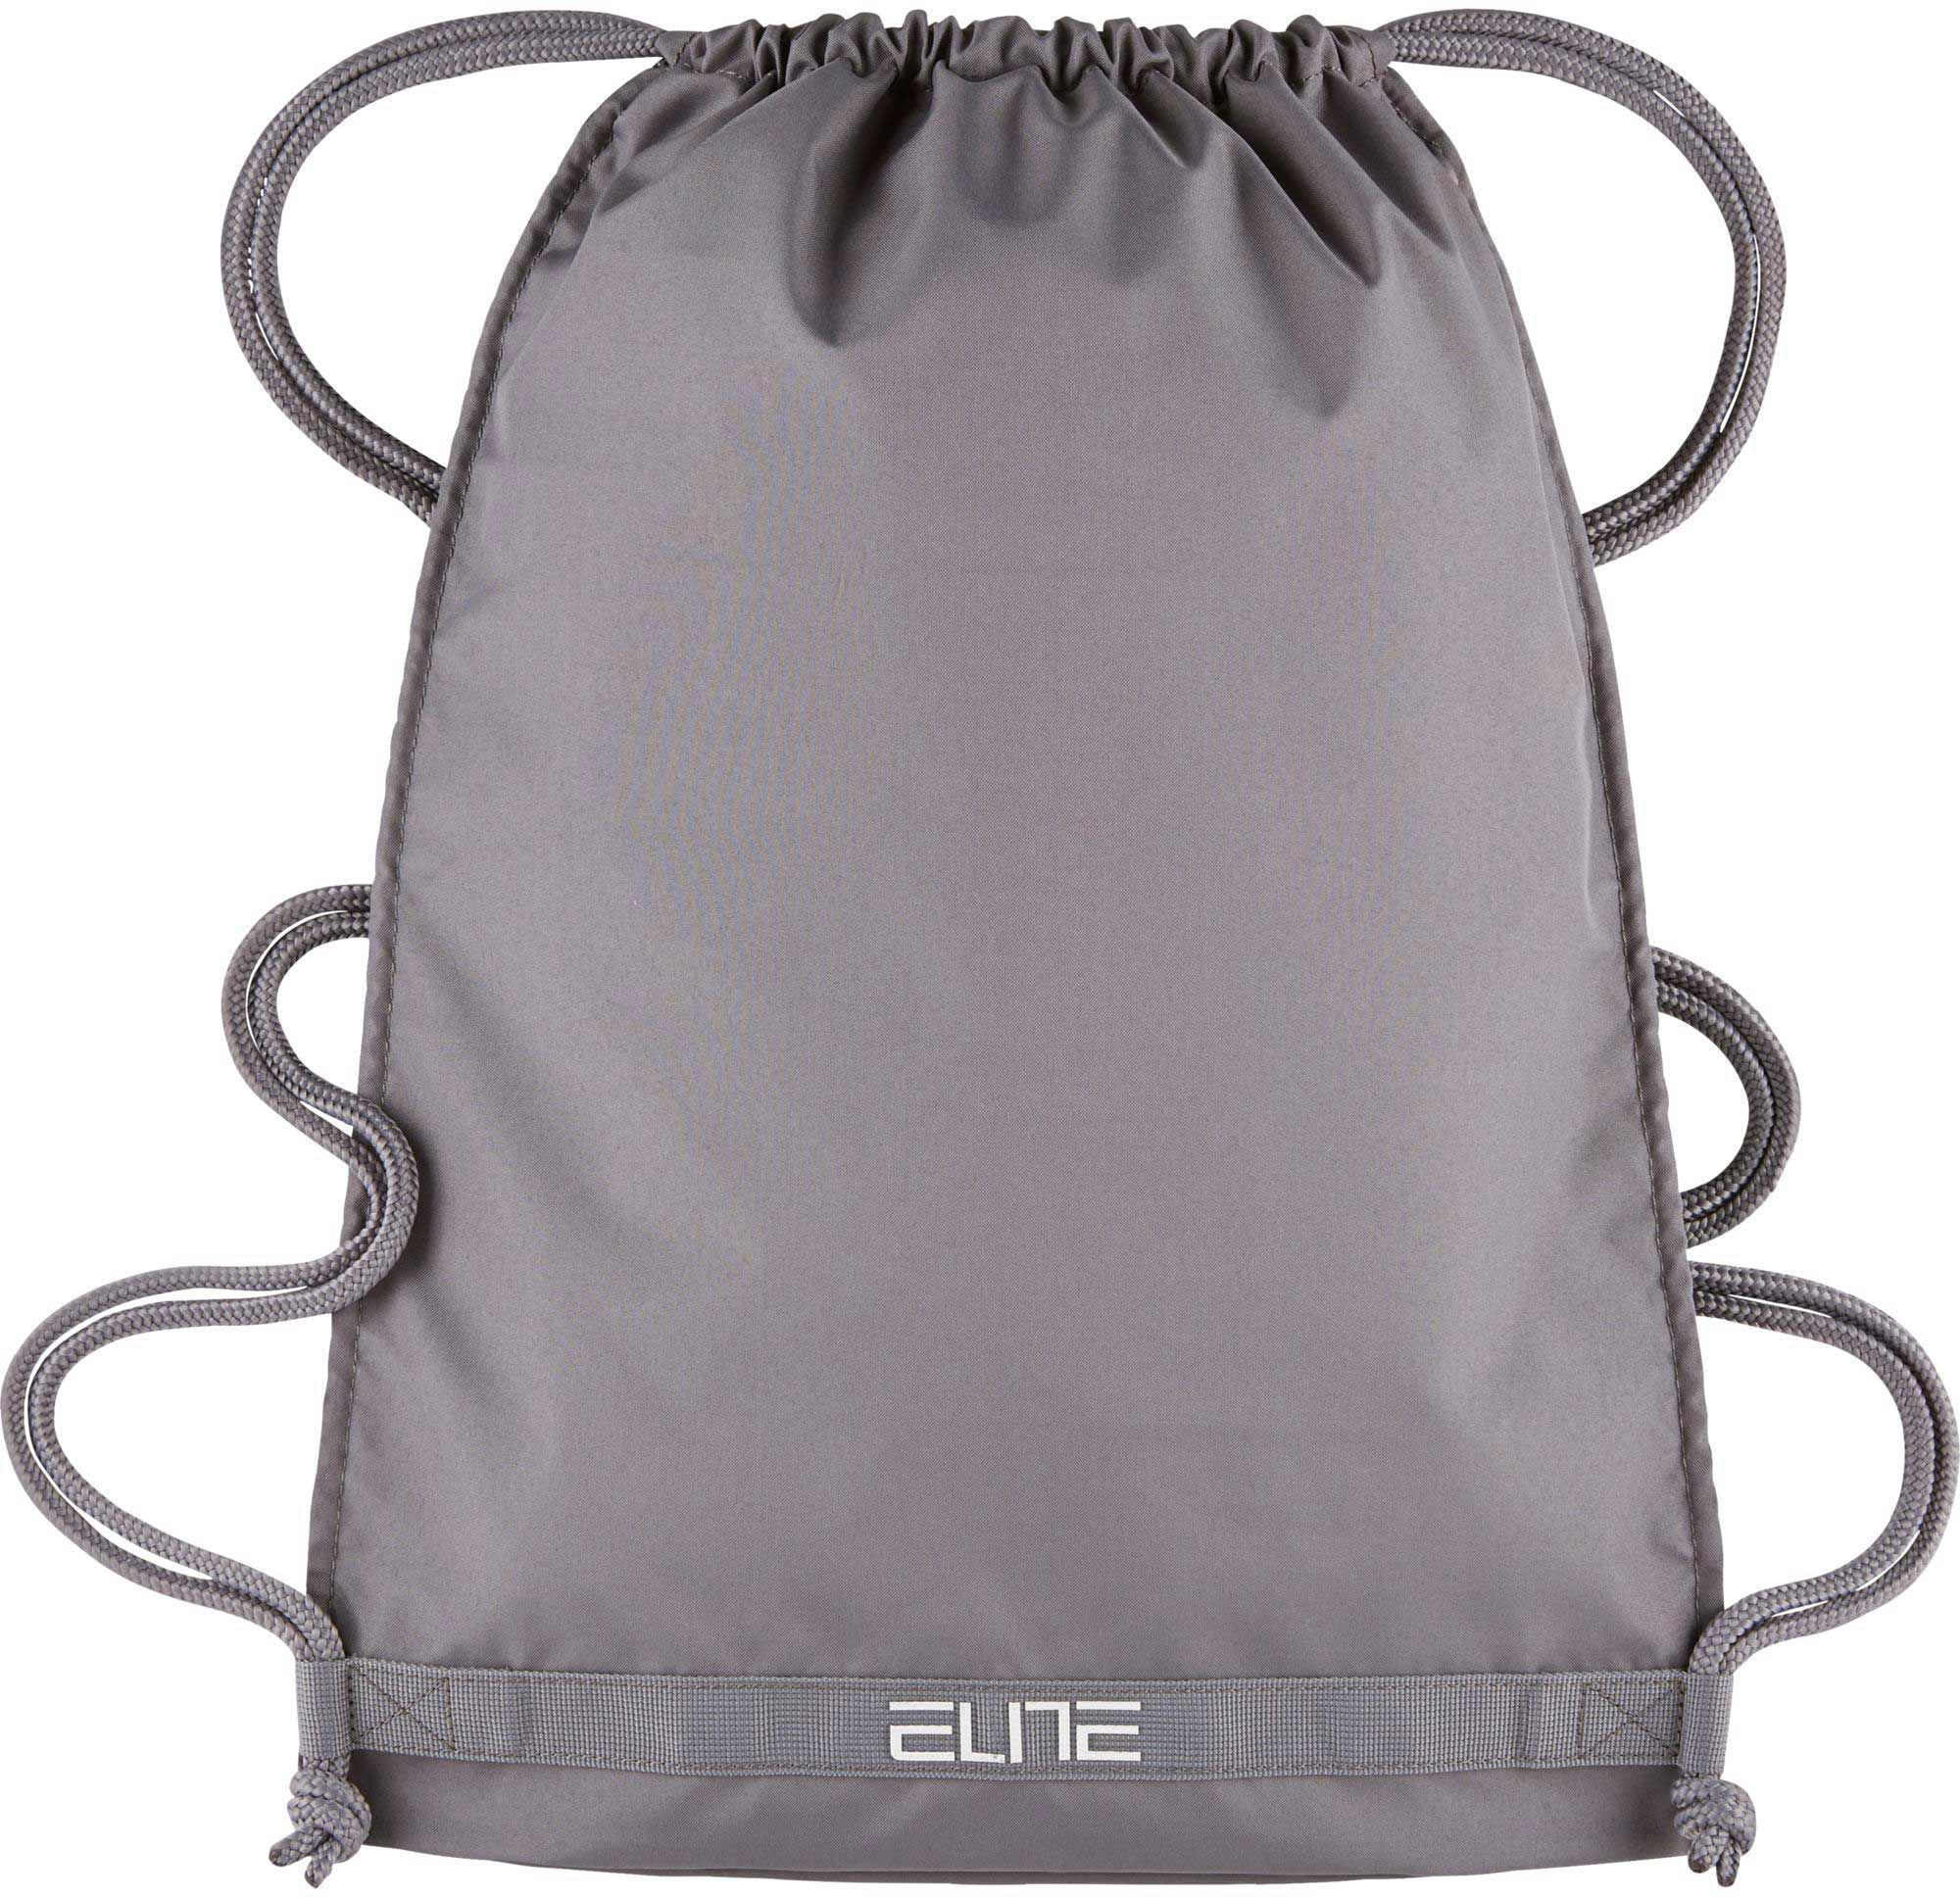 Lyst - Nike Hoops Elite Gym Sack Pack in Gray for Men 7fd6317a7501b